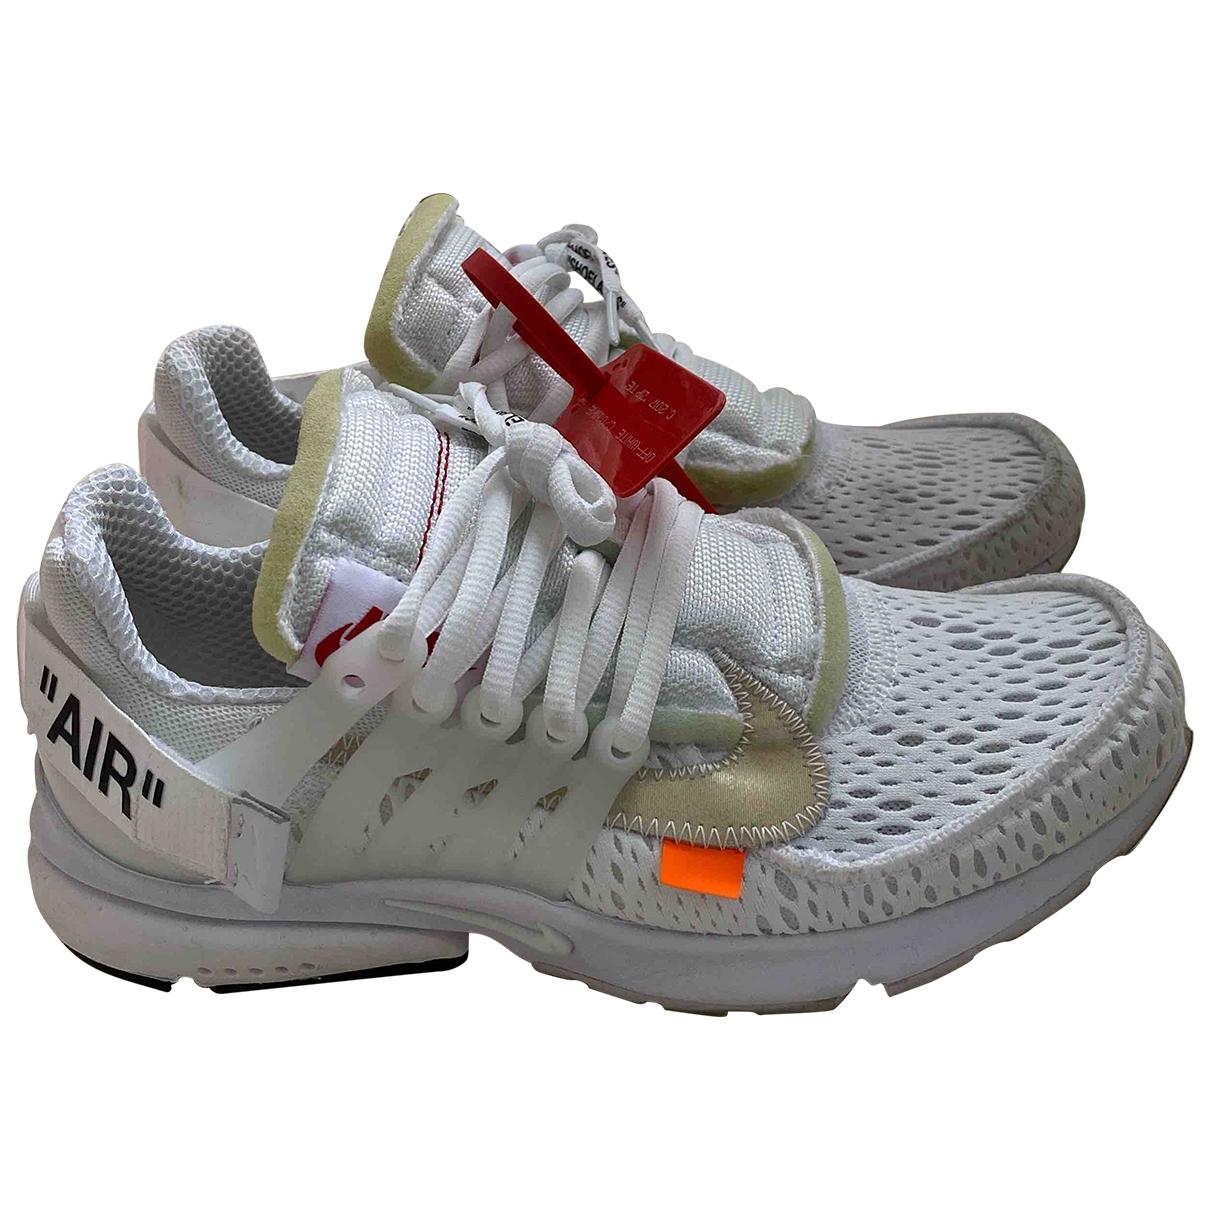 Deportivas Air Presto de Lona Nike X Off-white